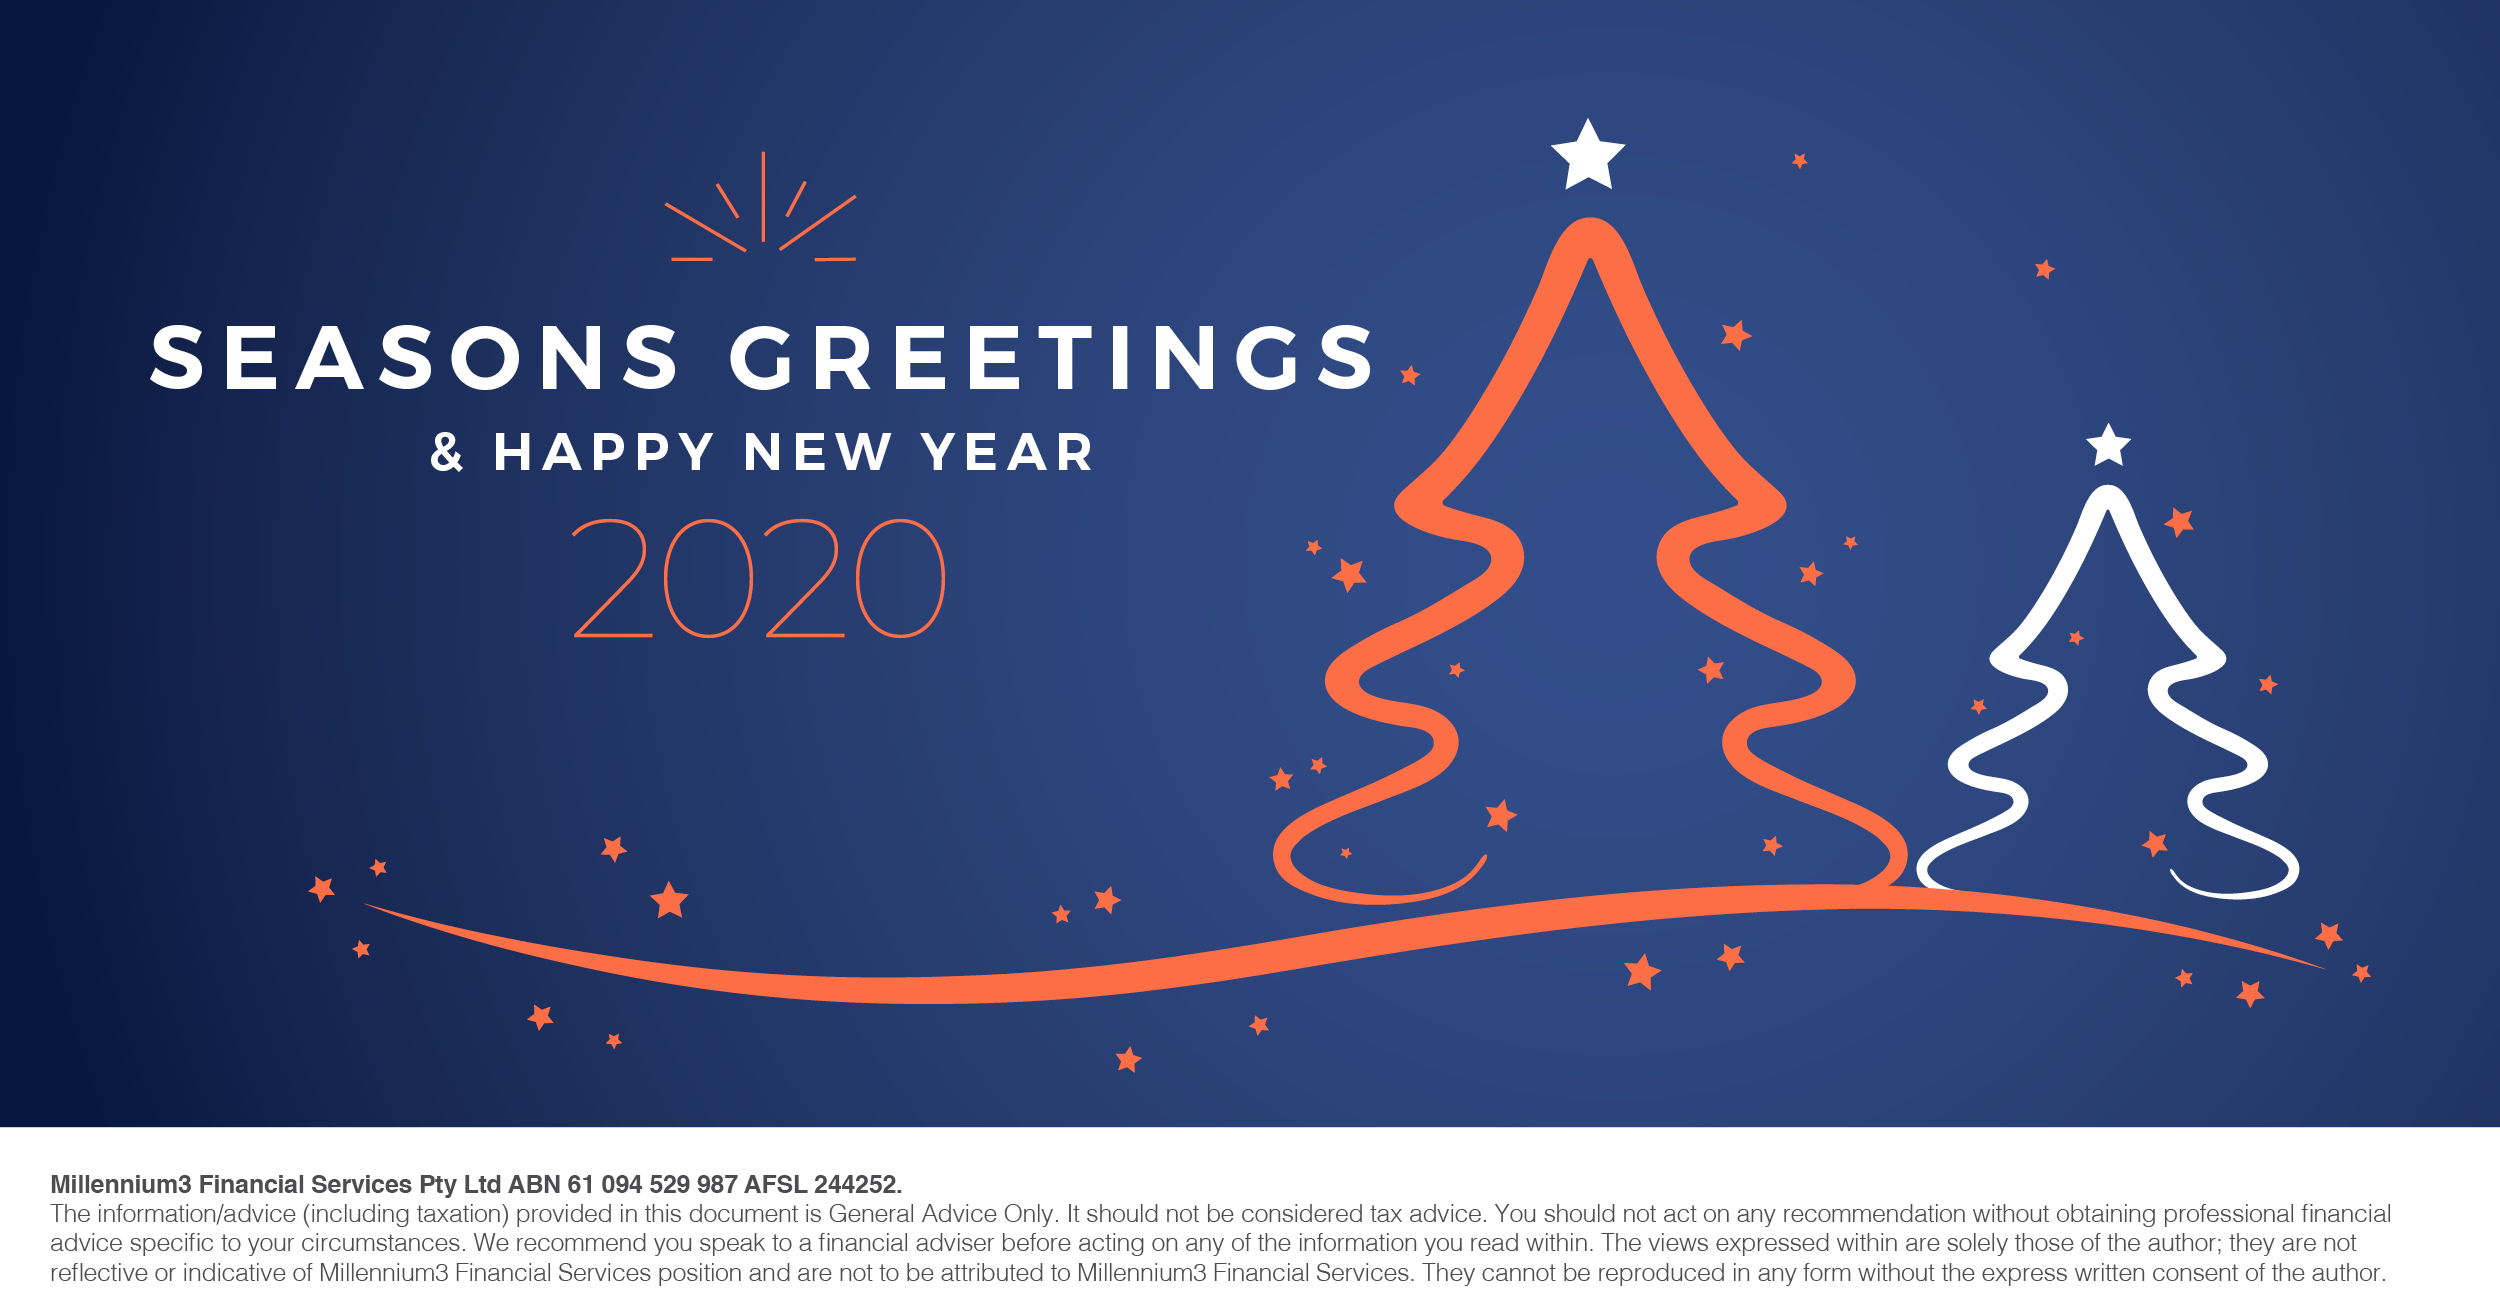 Infographic_Seasons greetings2_M3